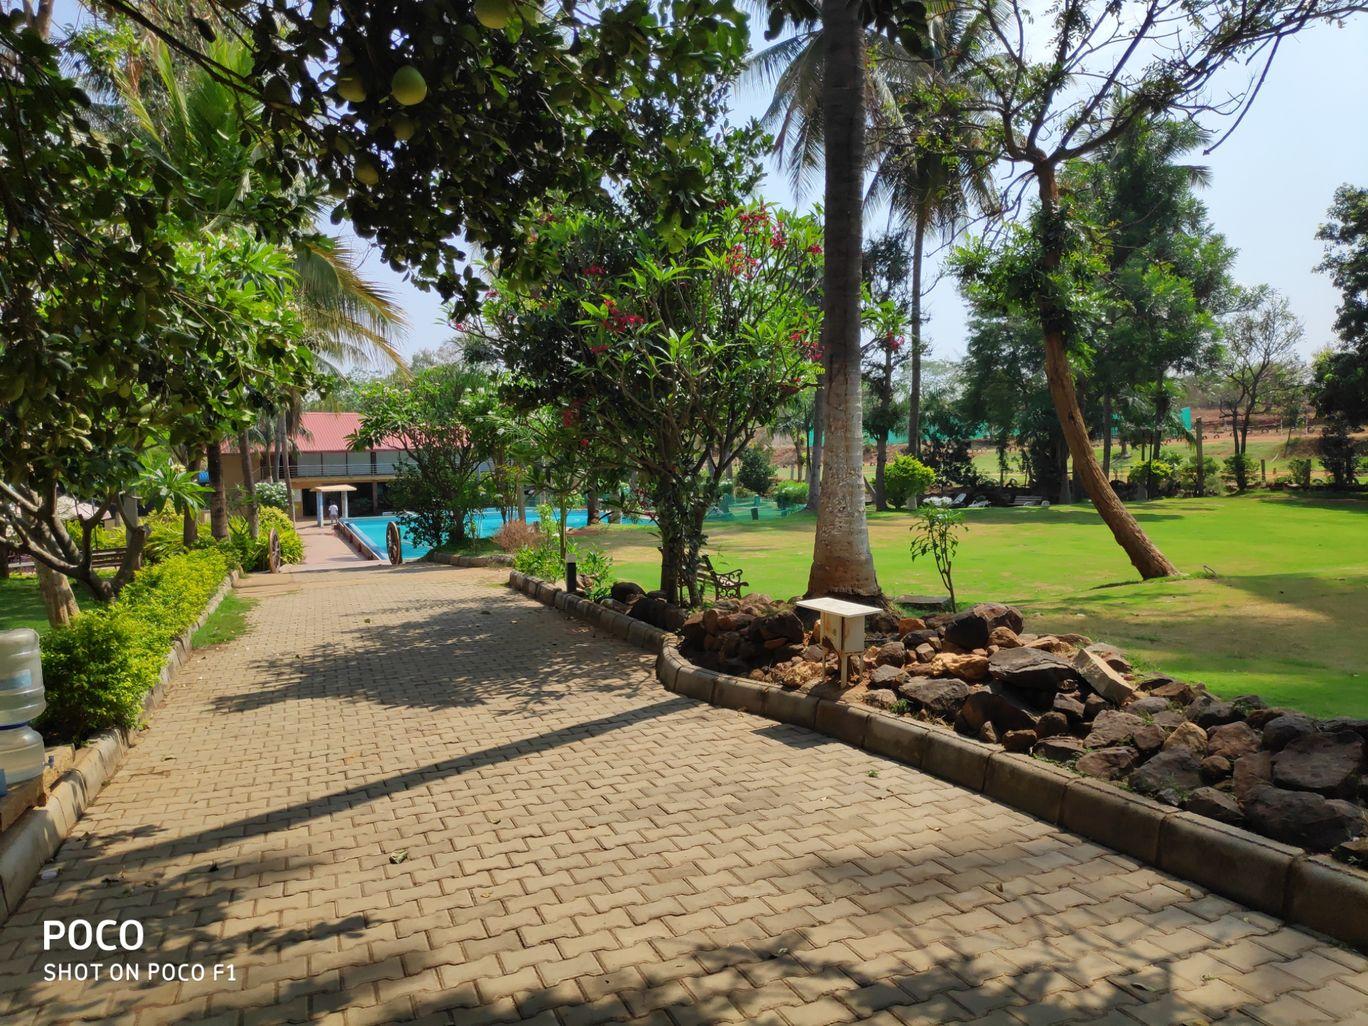 Photo of Elim Resorts By chethan gowda